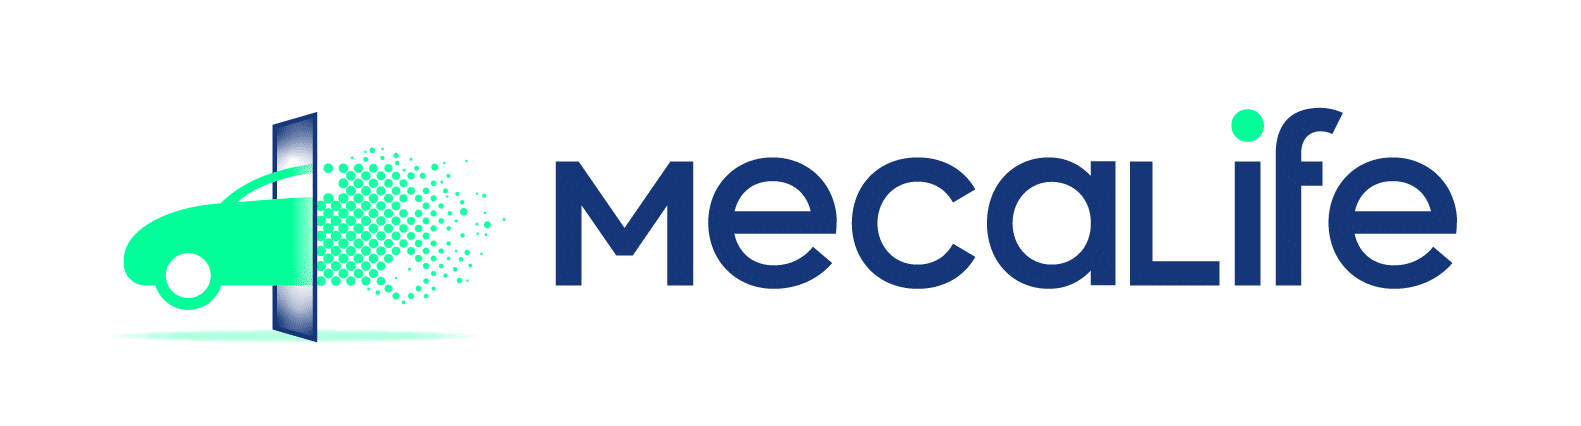 Mecavin